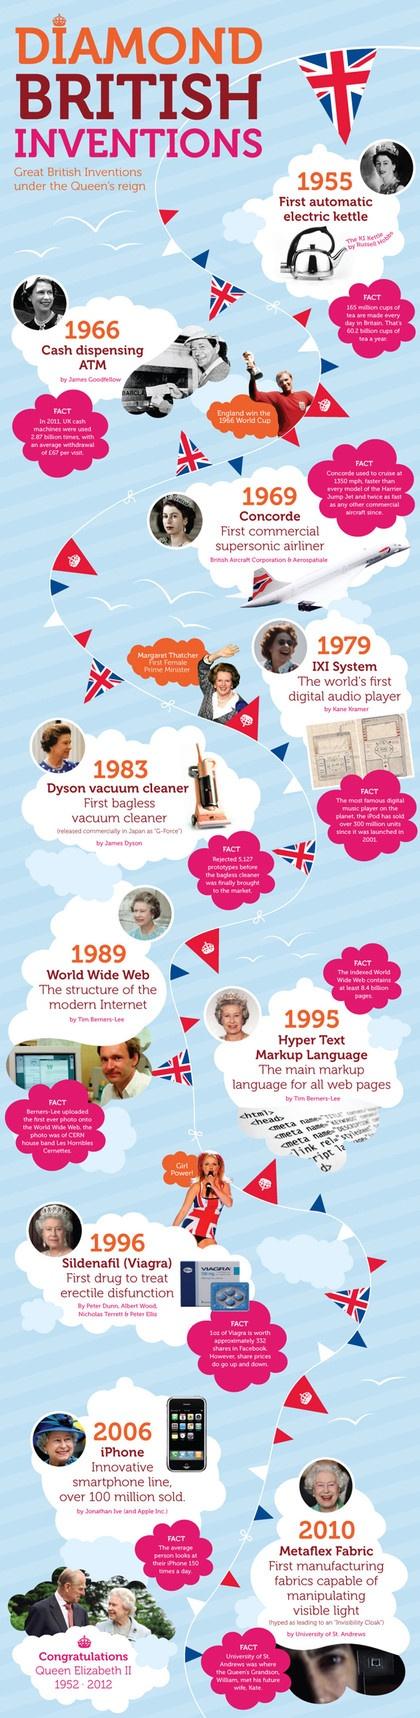 British inventions infographic